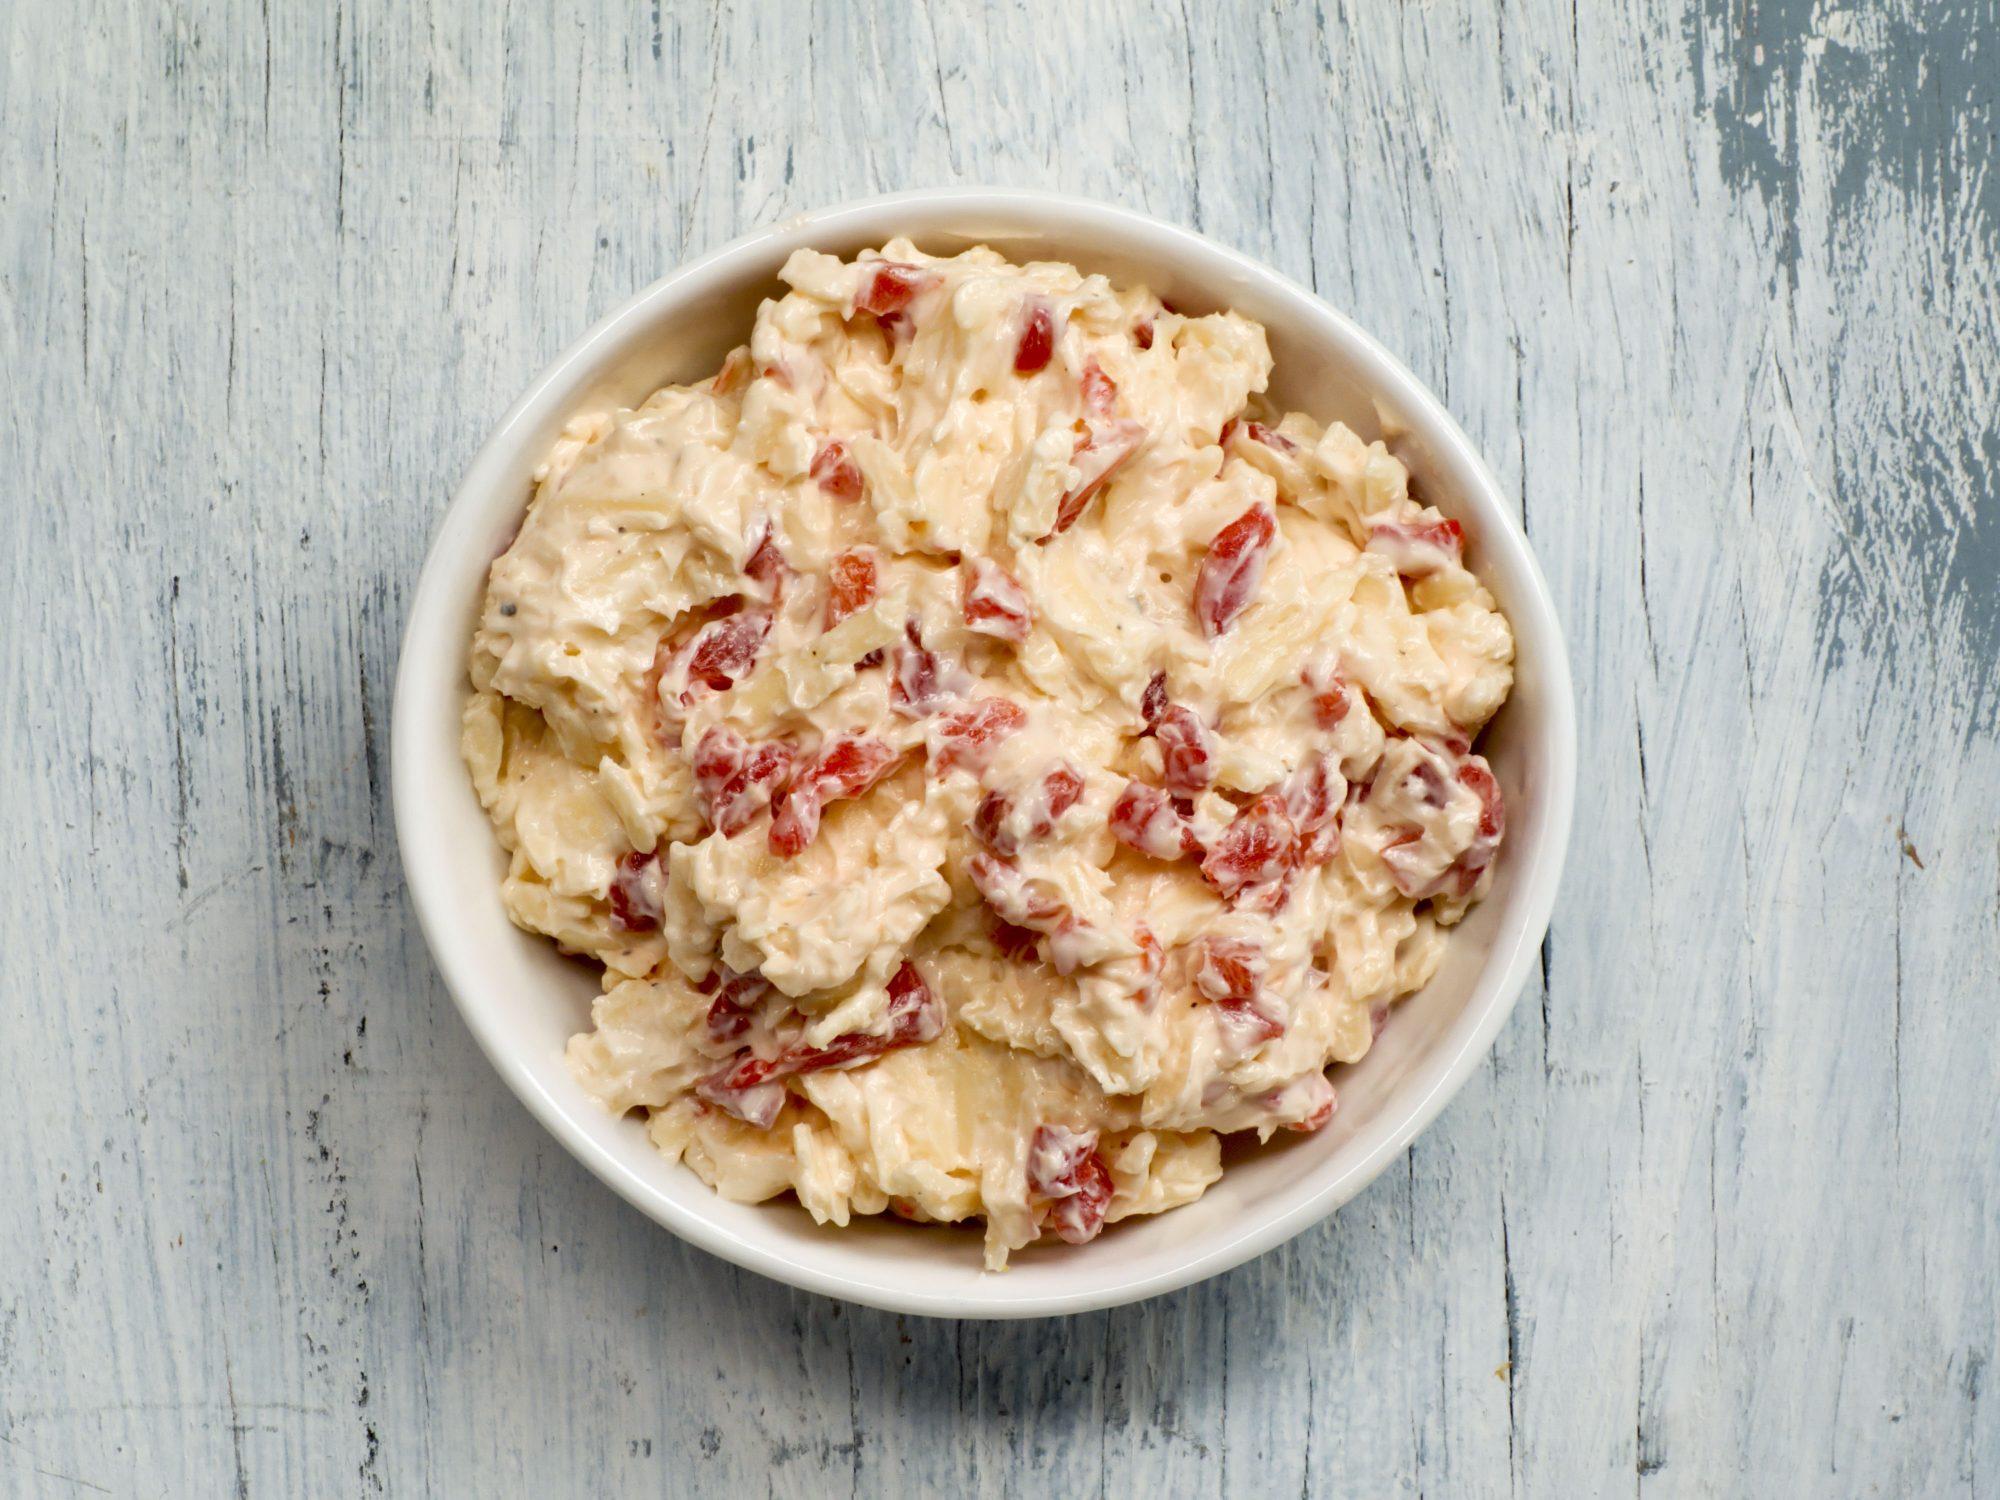 Recipes For College Students Myrecipes